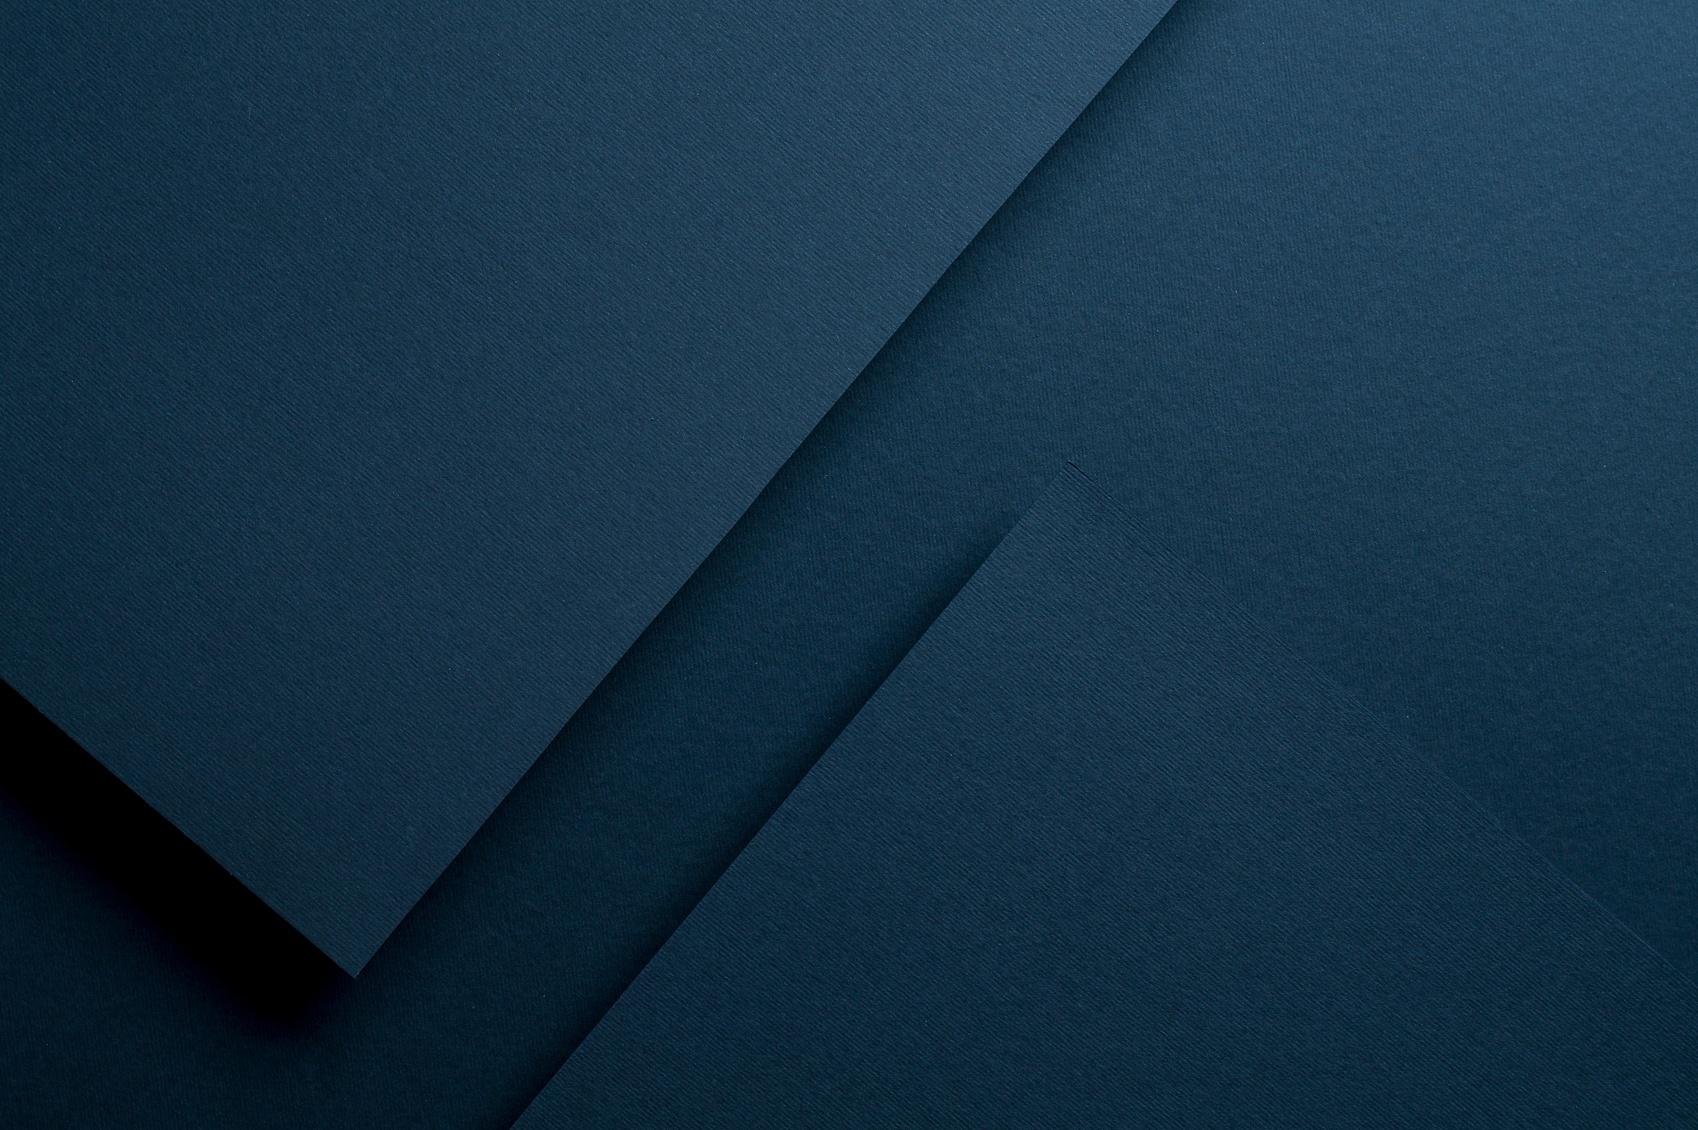 Material-design-background-000087900331_Medium.jpg